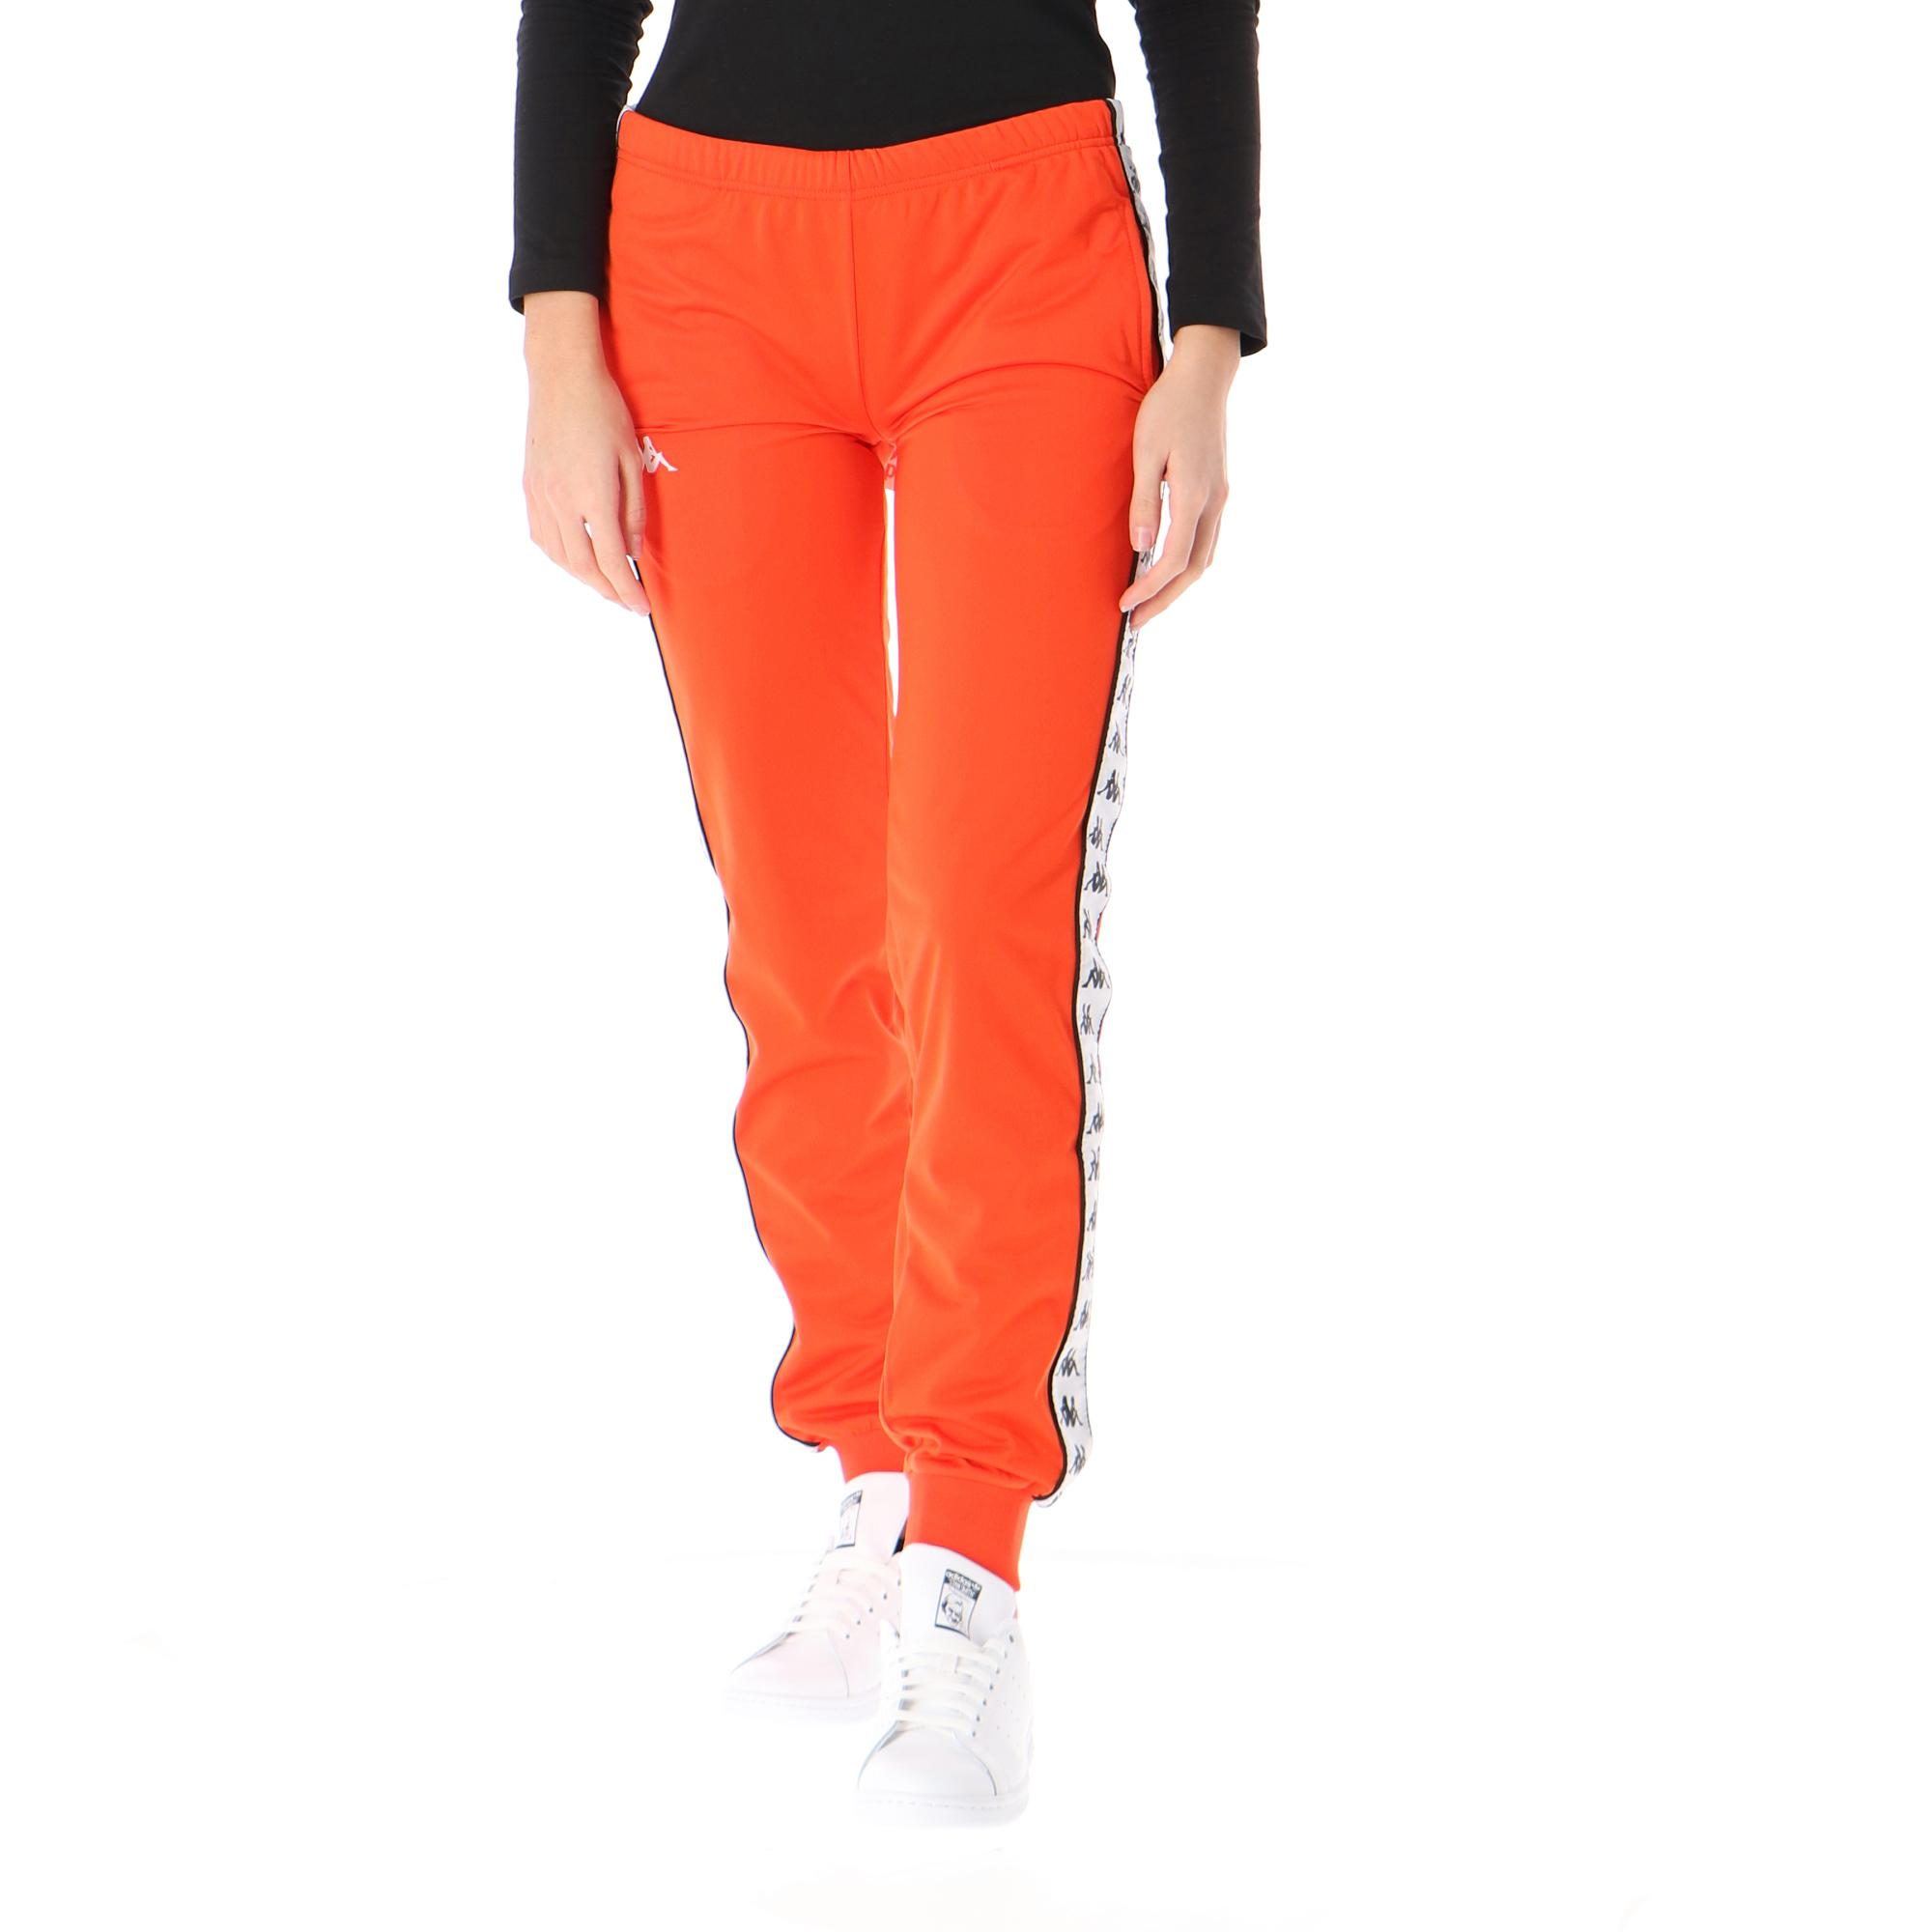 Kappa 222 Banda Rastoria Slim Orange flame white